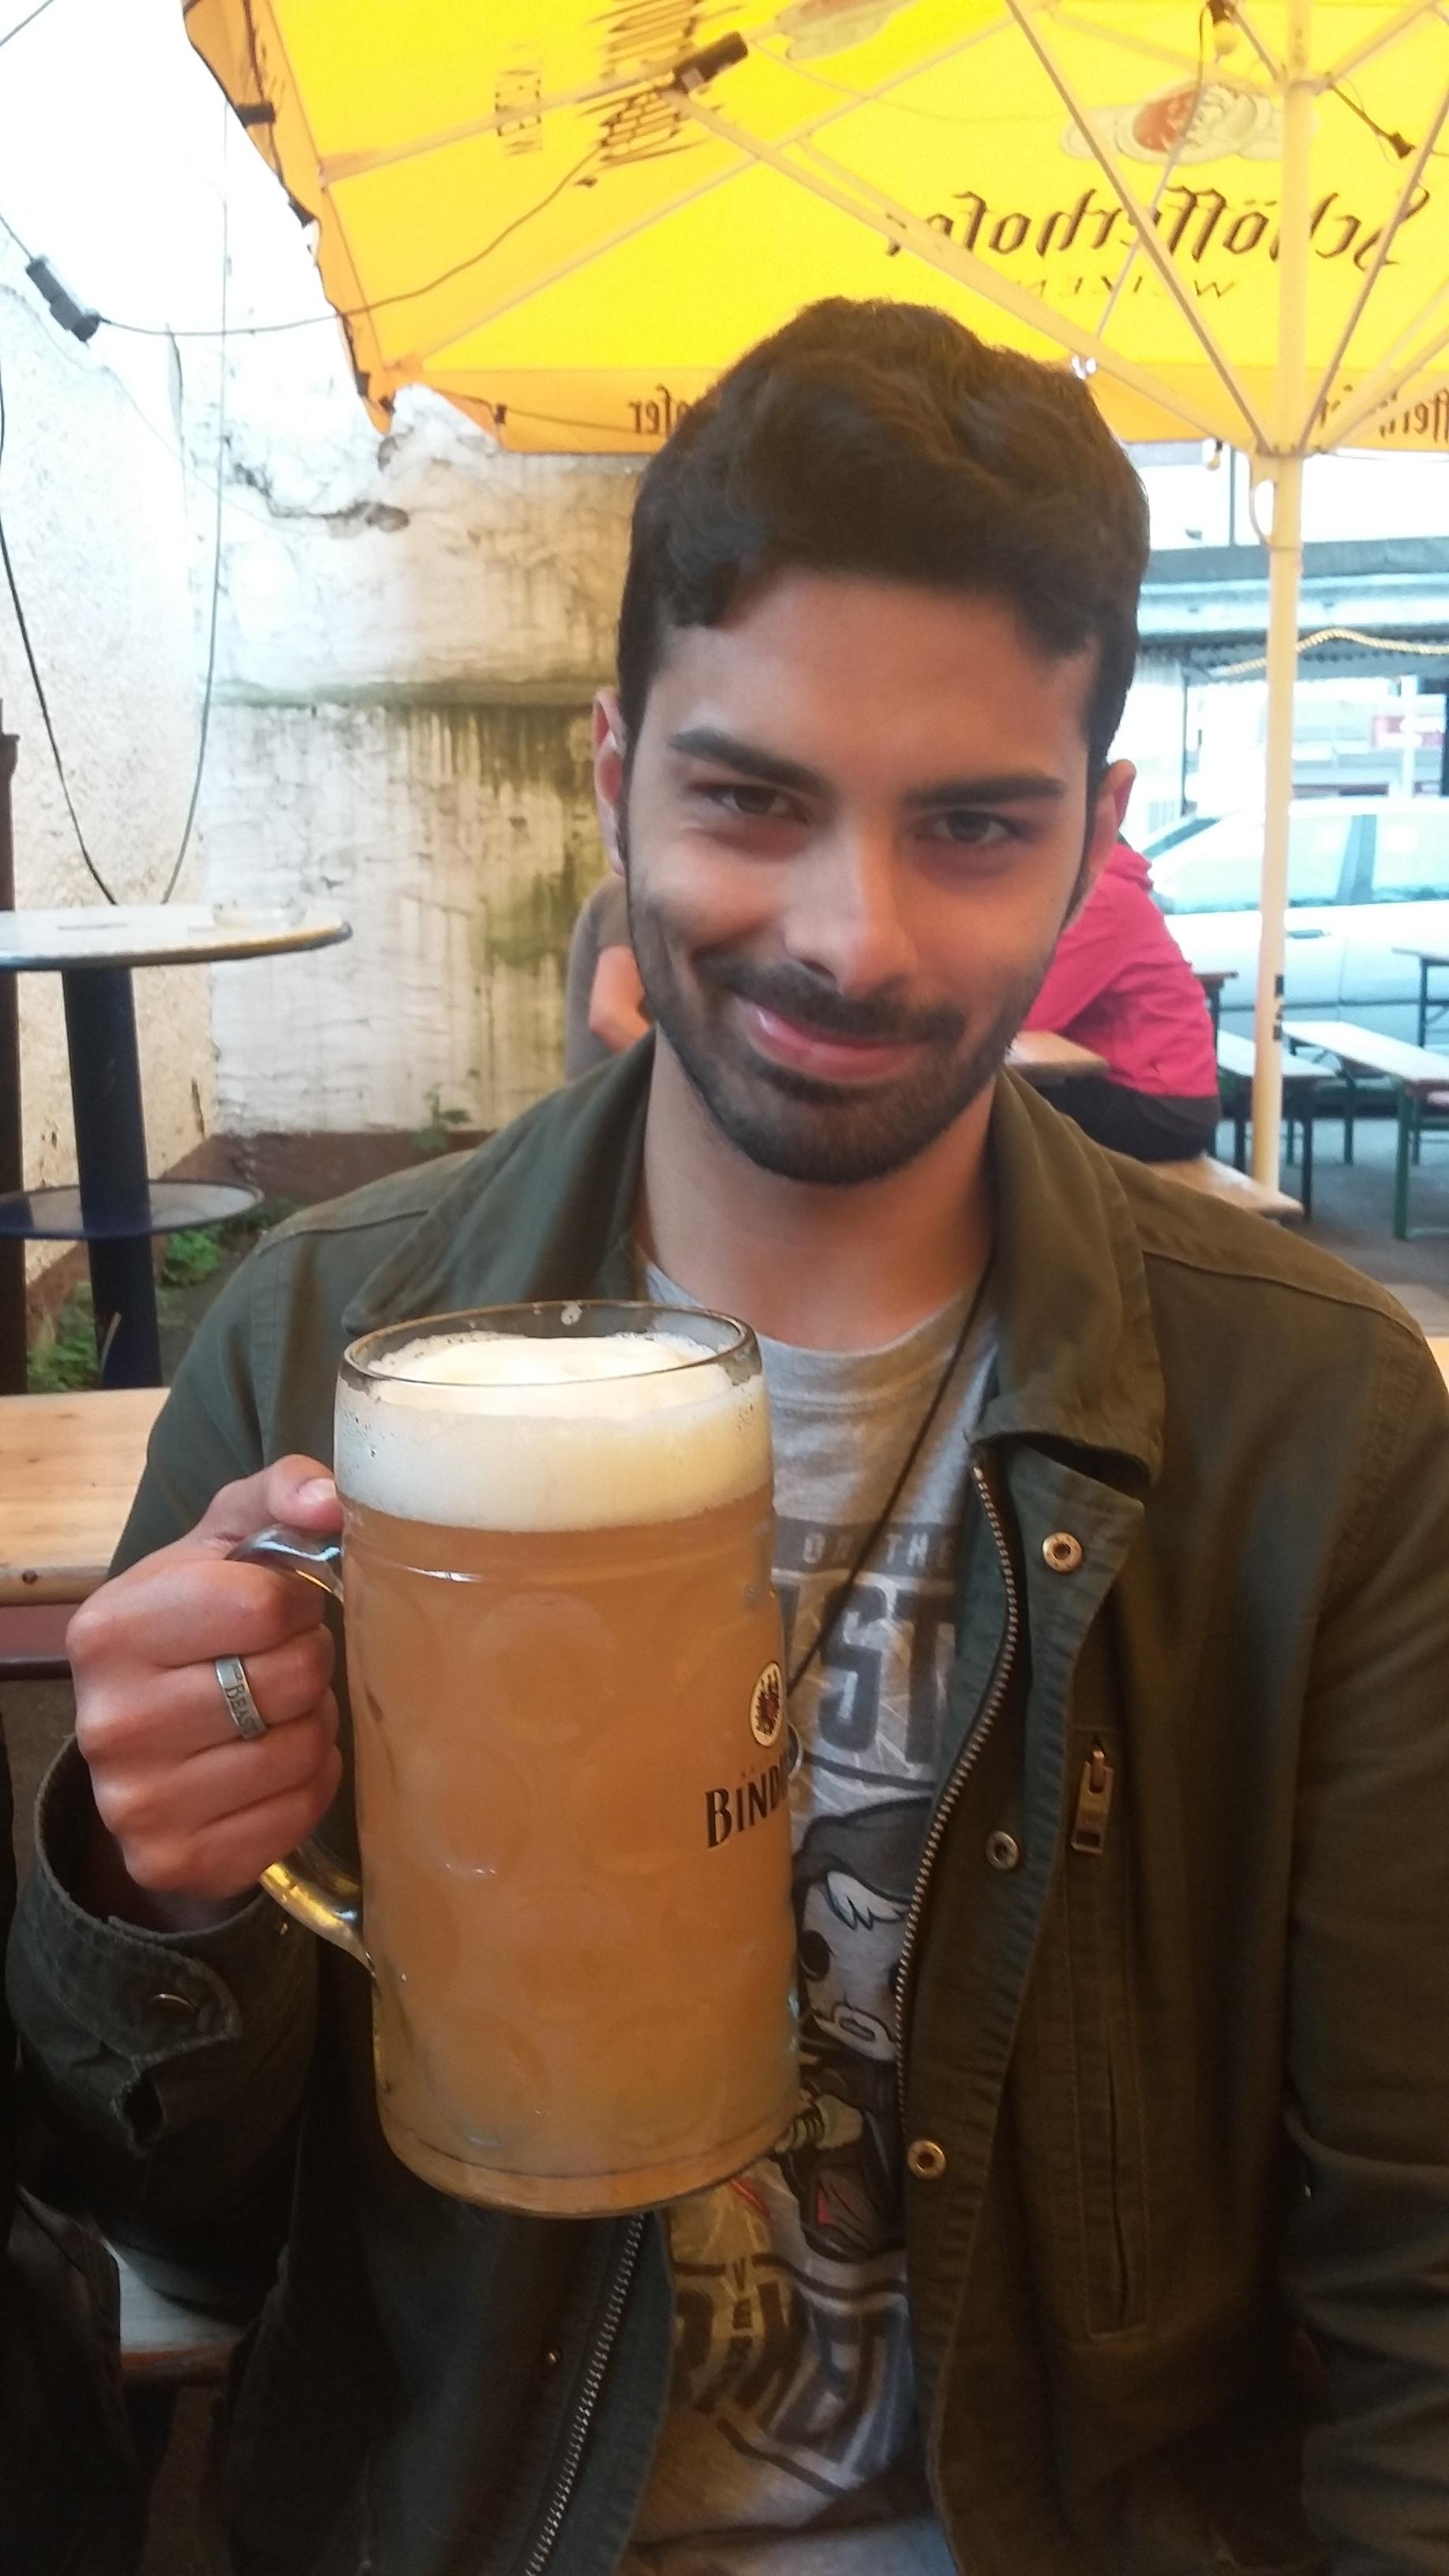 Stephane enjoying the local beverage of choice at Documenta!